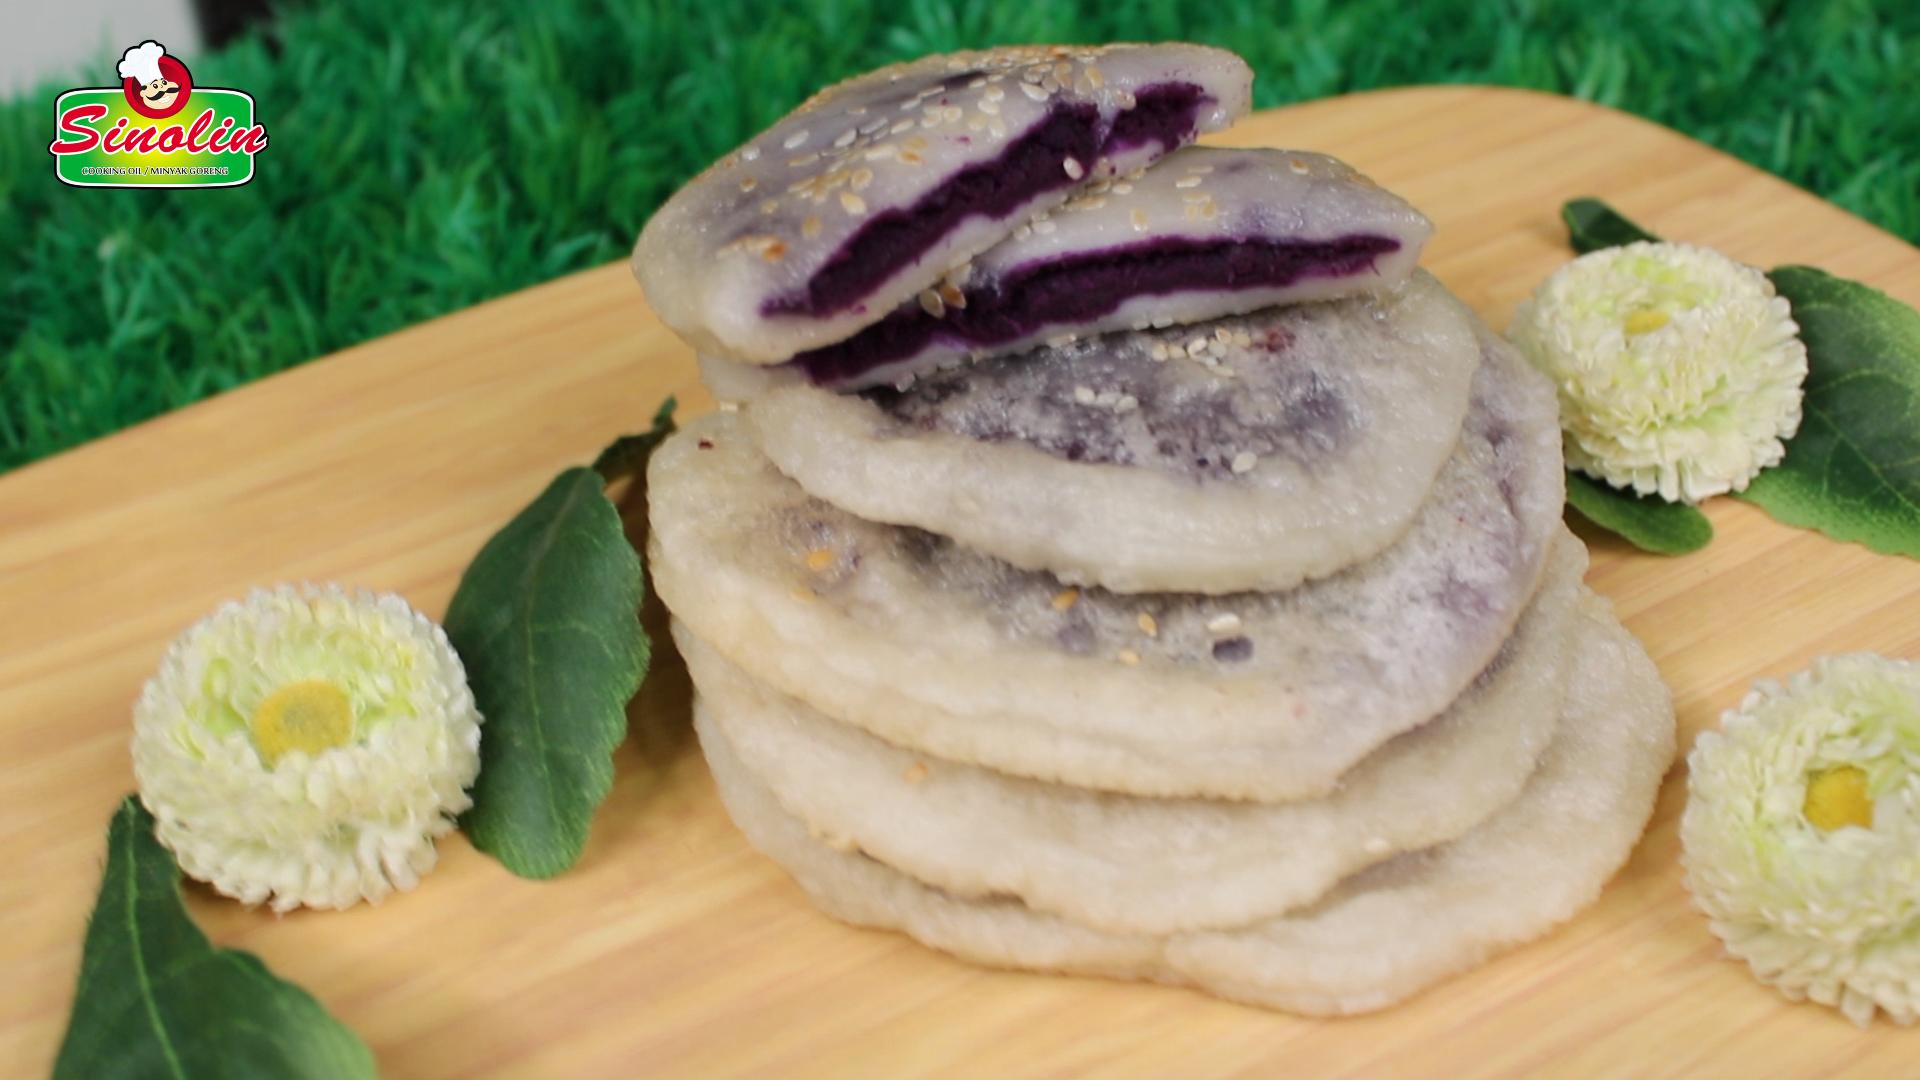 Purple Sweet Potato Cake Oleh Dapur Sinolin